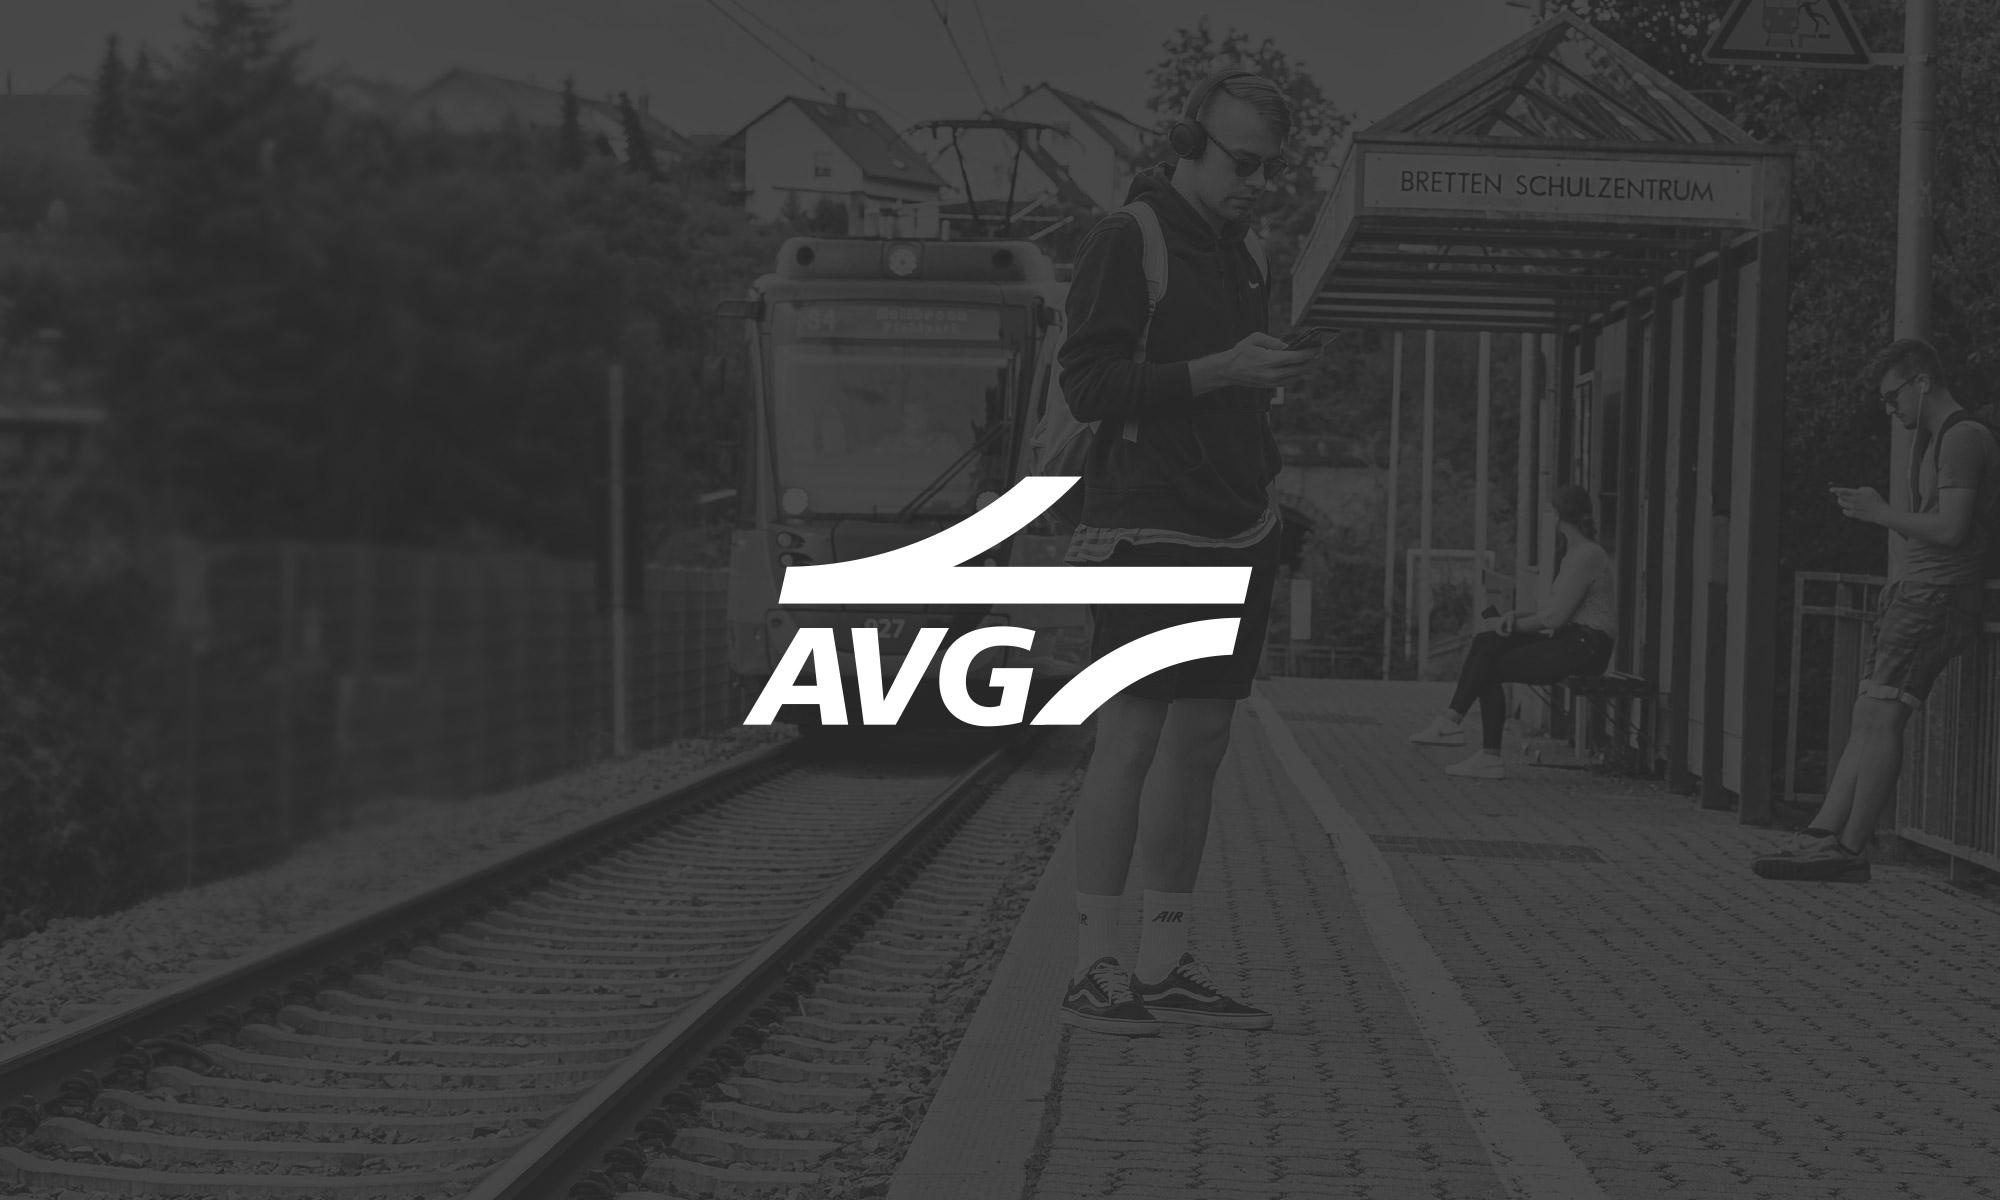 Werbeagentur Karlsruhe Verkehrsbetriebe AVG Karlsruhe